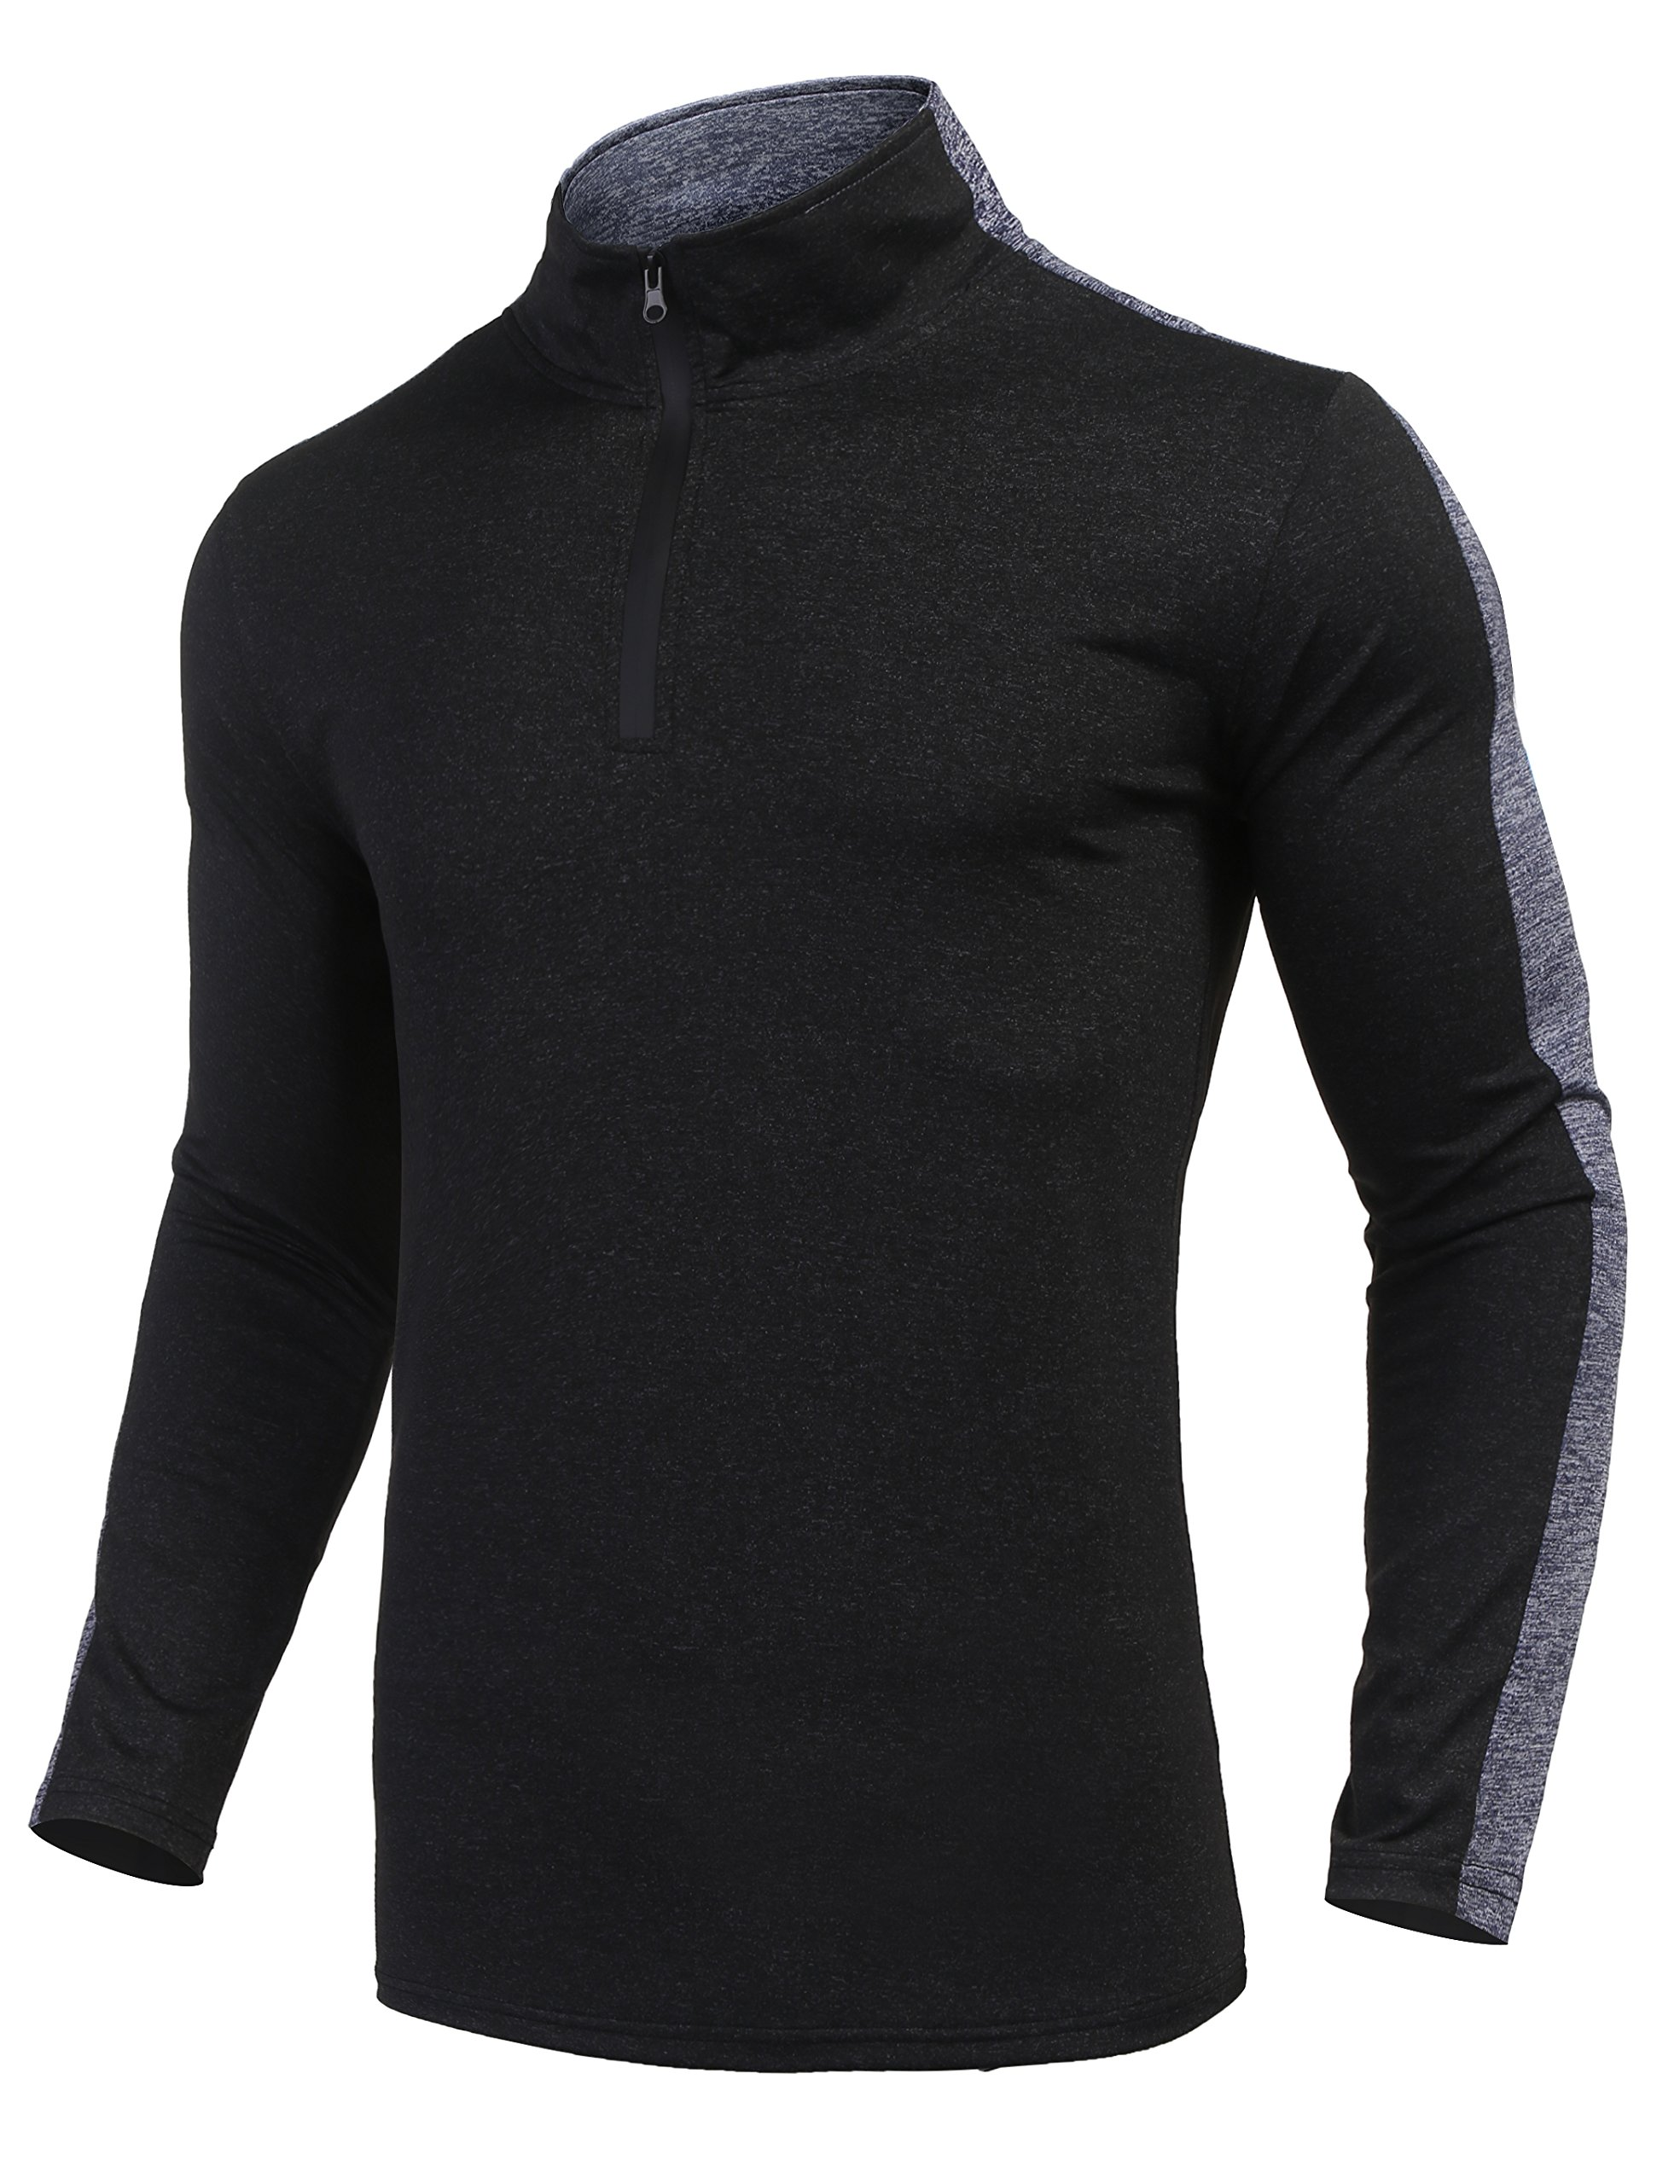 JINIDU Men's Long Sleeve Active 1/4 Zip T Shirt Quick Dry Sports Tops Cycling Jersey Running Training Gym Pullover by JINIDU